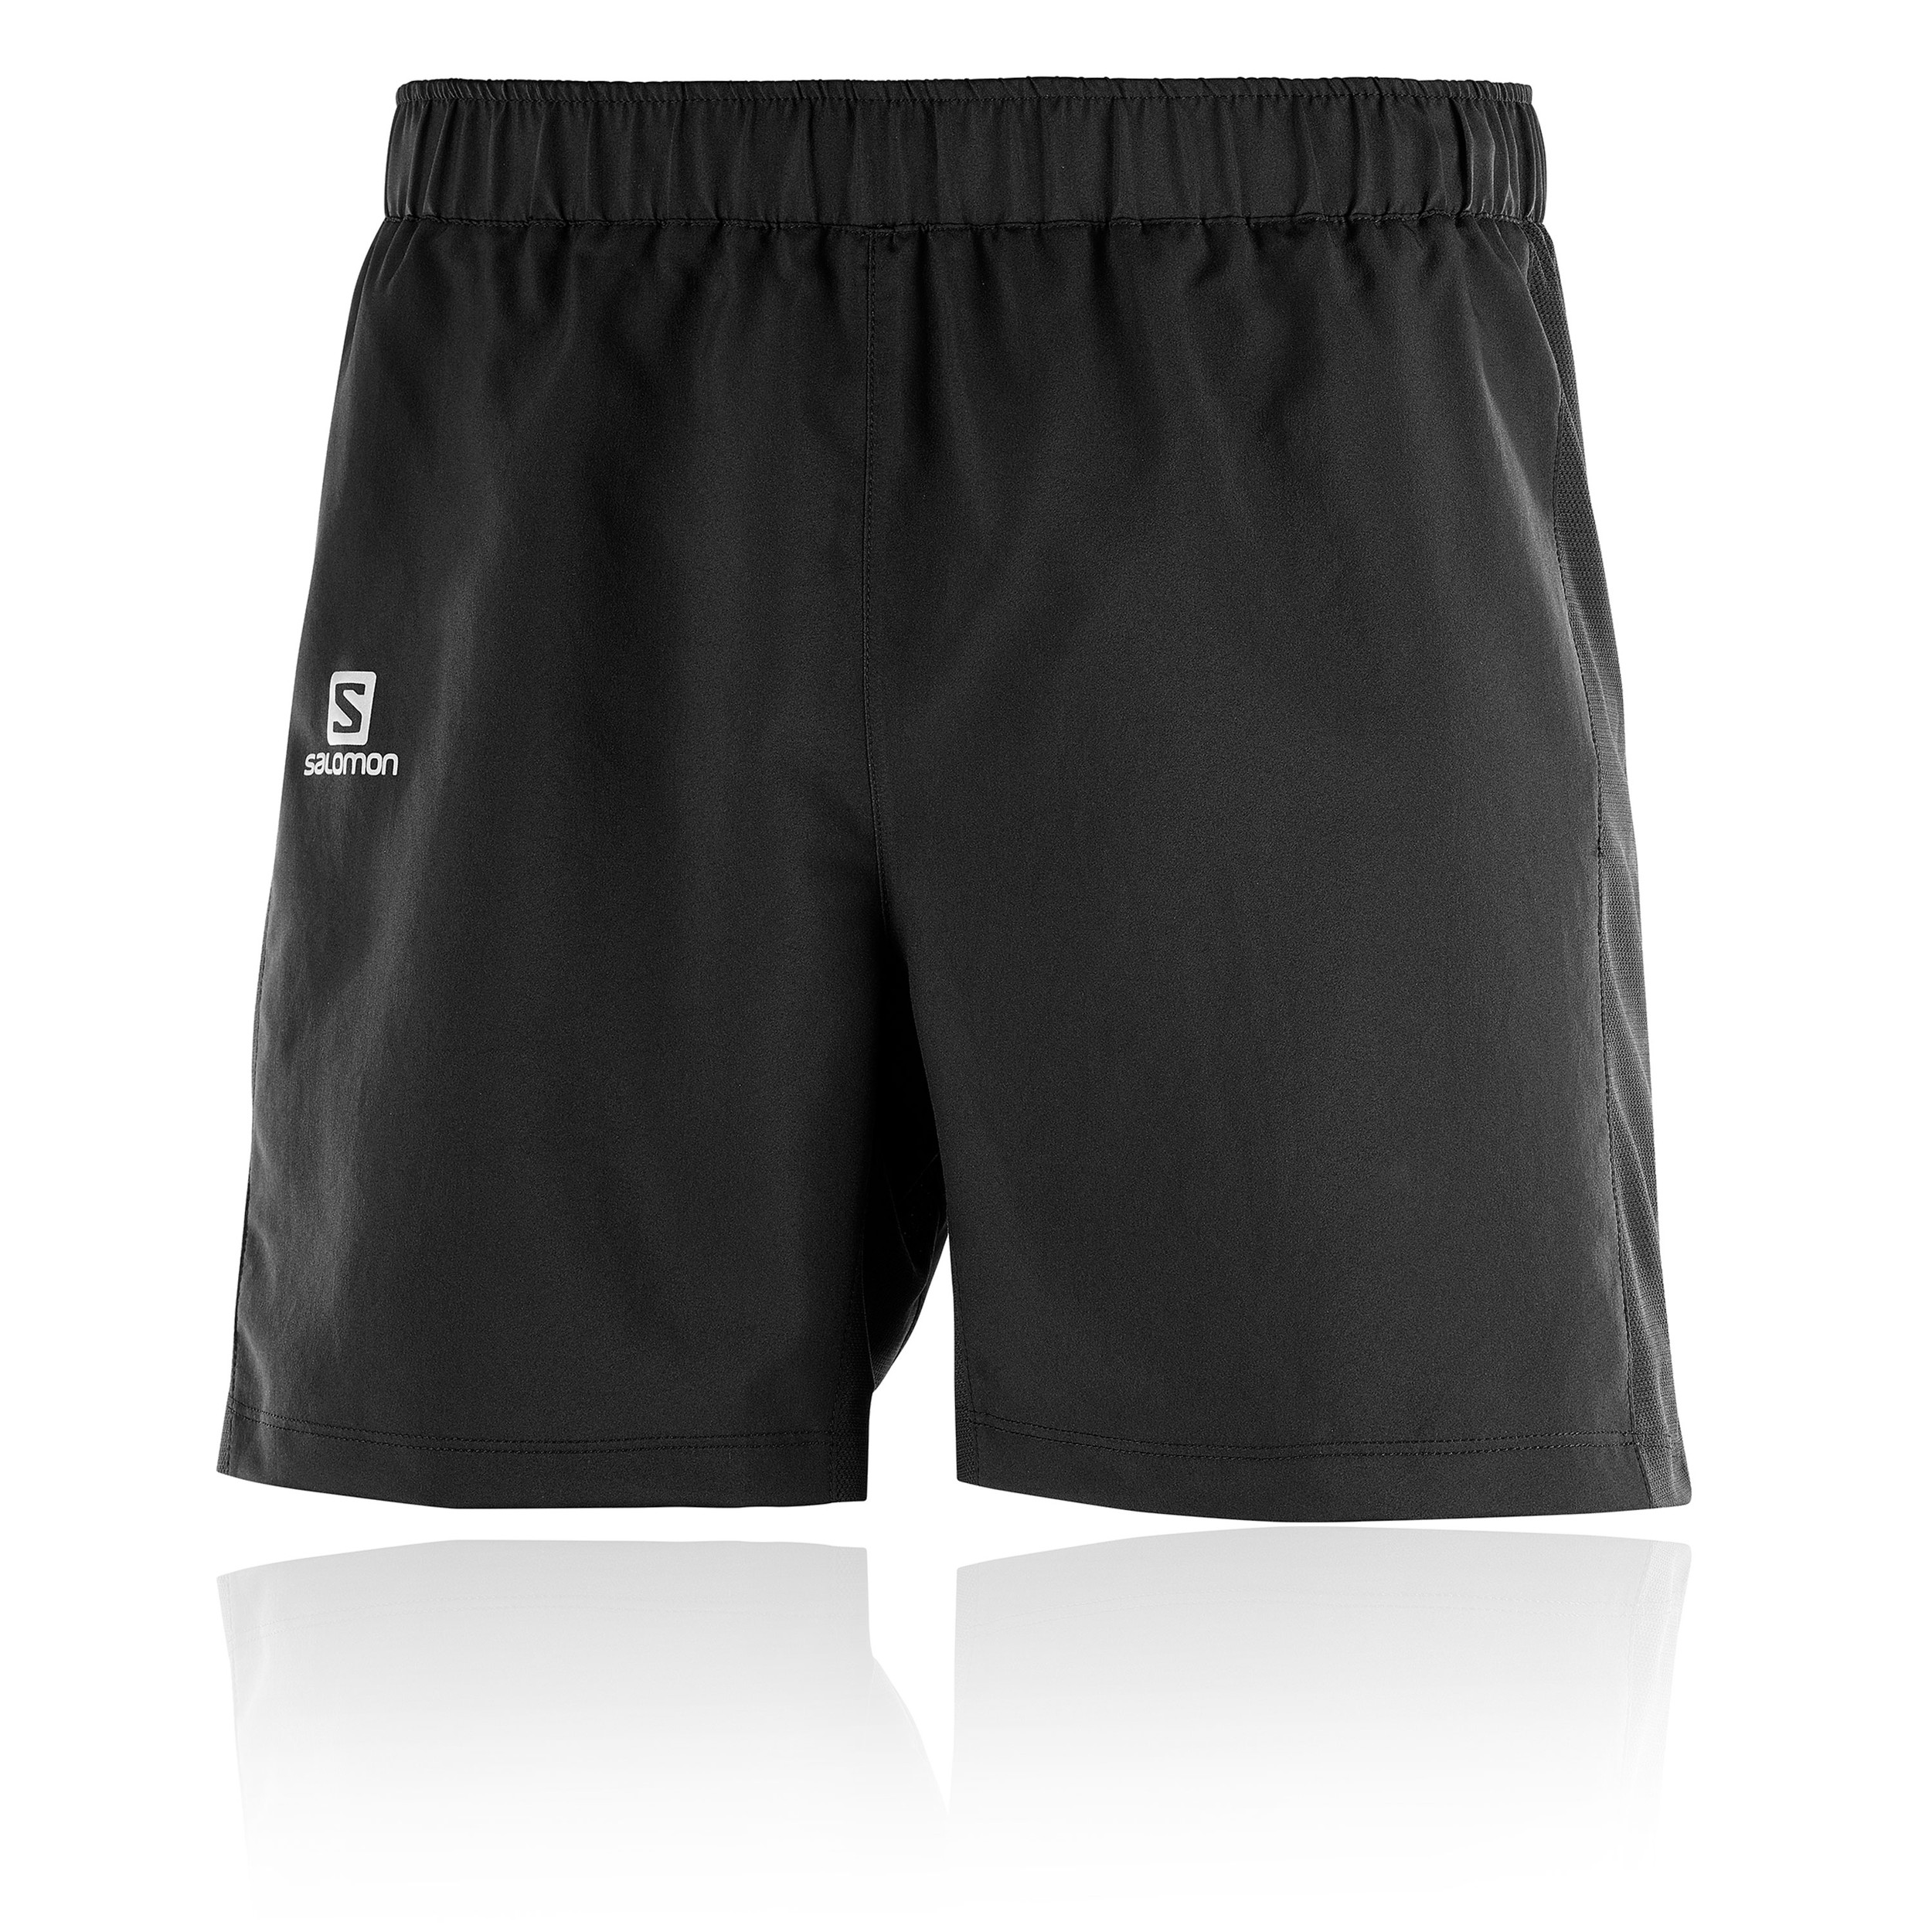 Salomon Agile 5 Inch Running Shorts - AW20